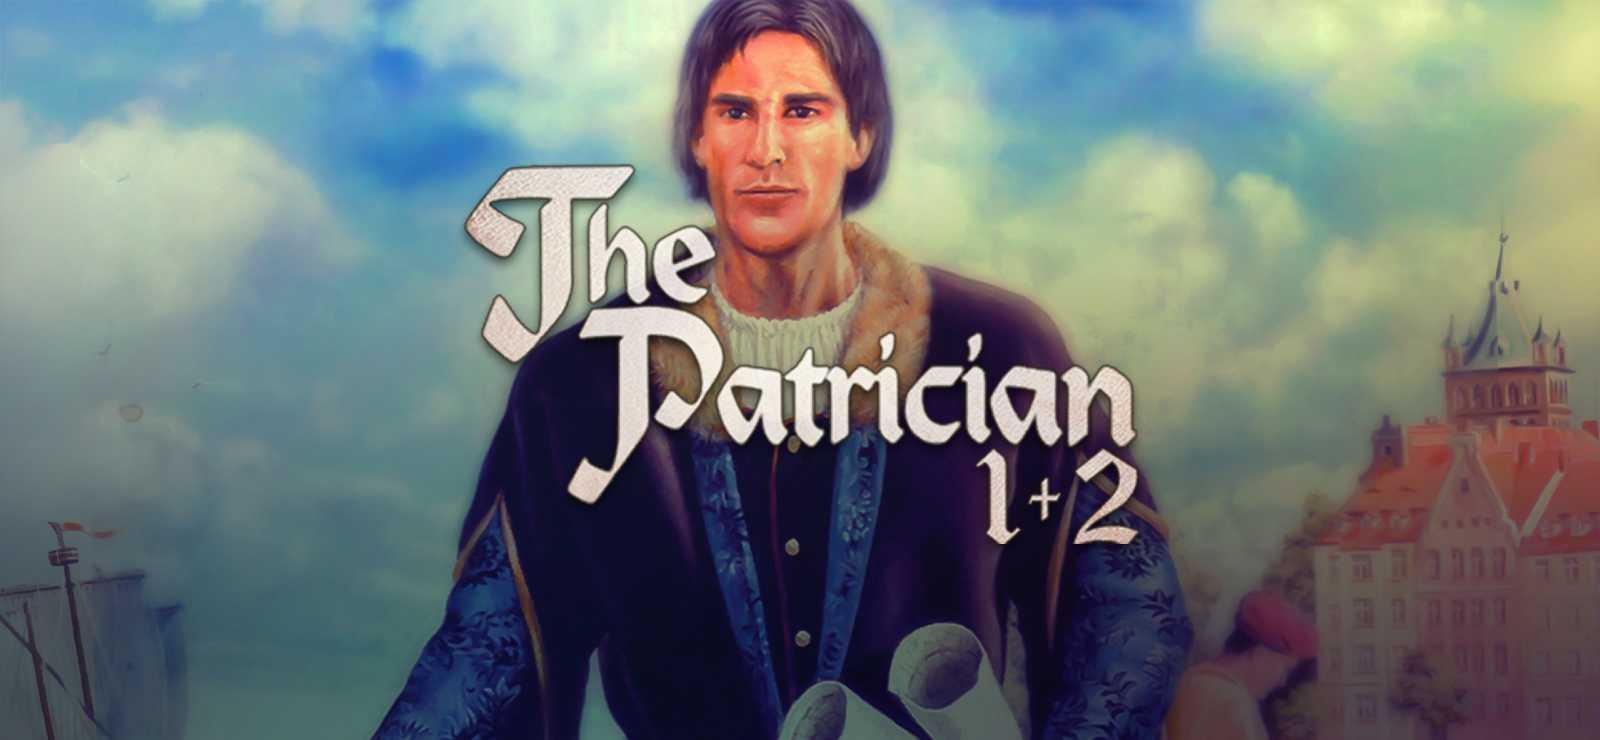 Patrician 1+2